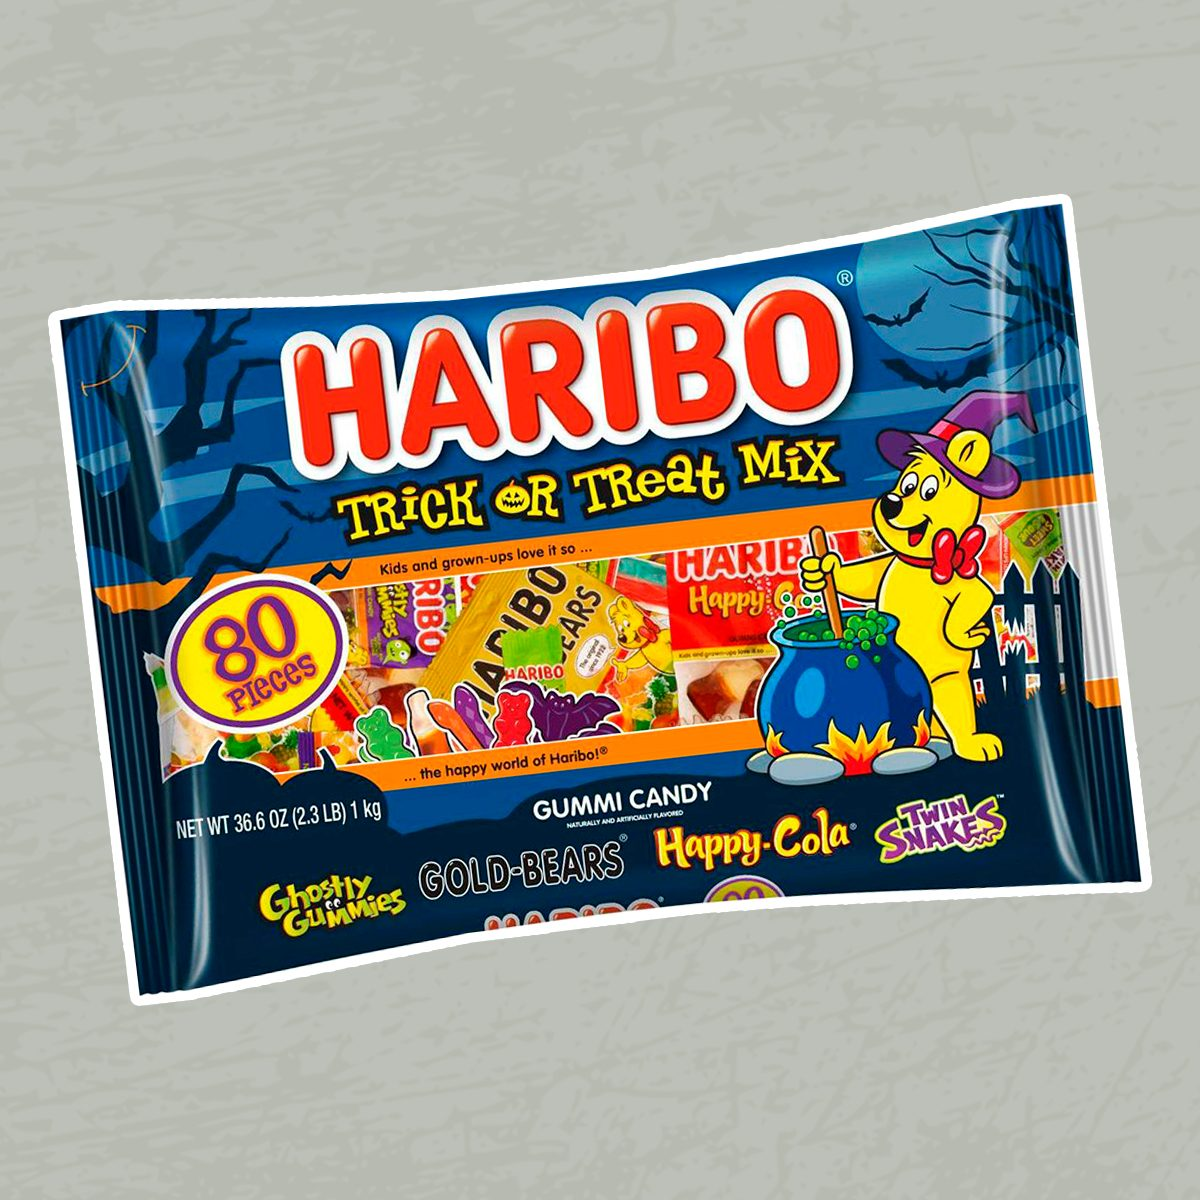 Haribo Halloween Trick or Treat Mix